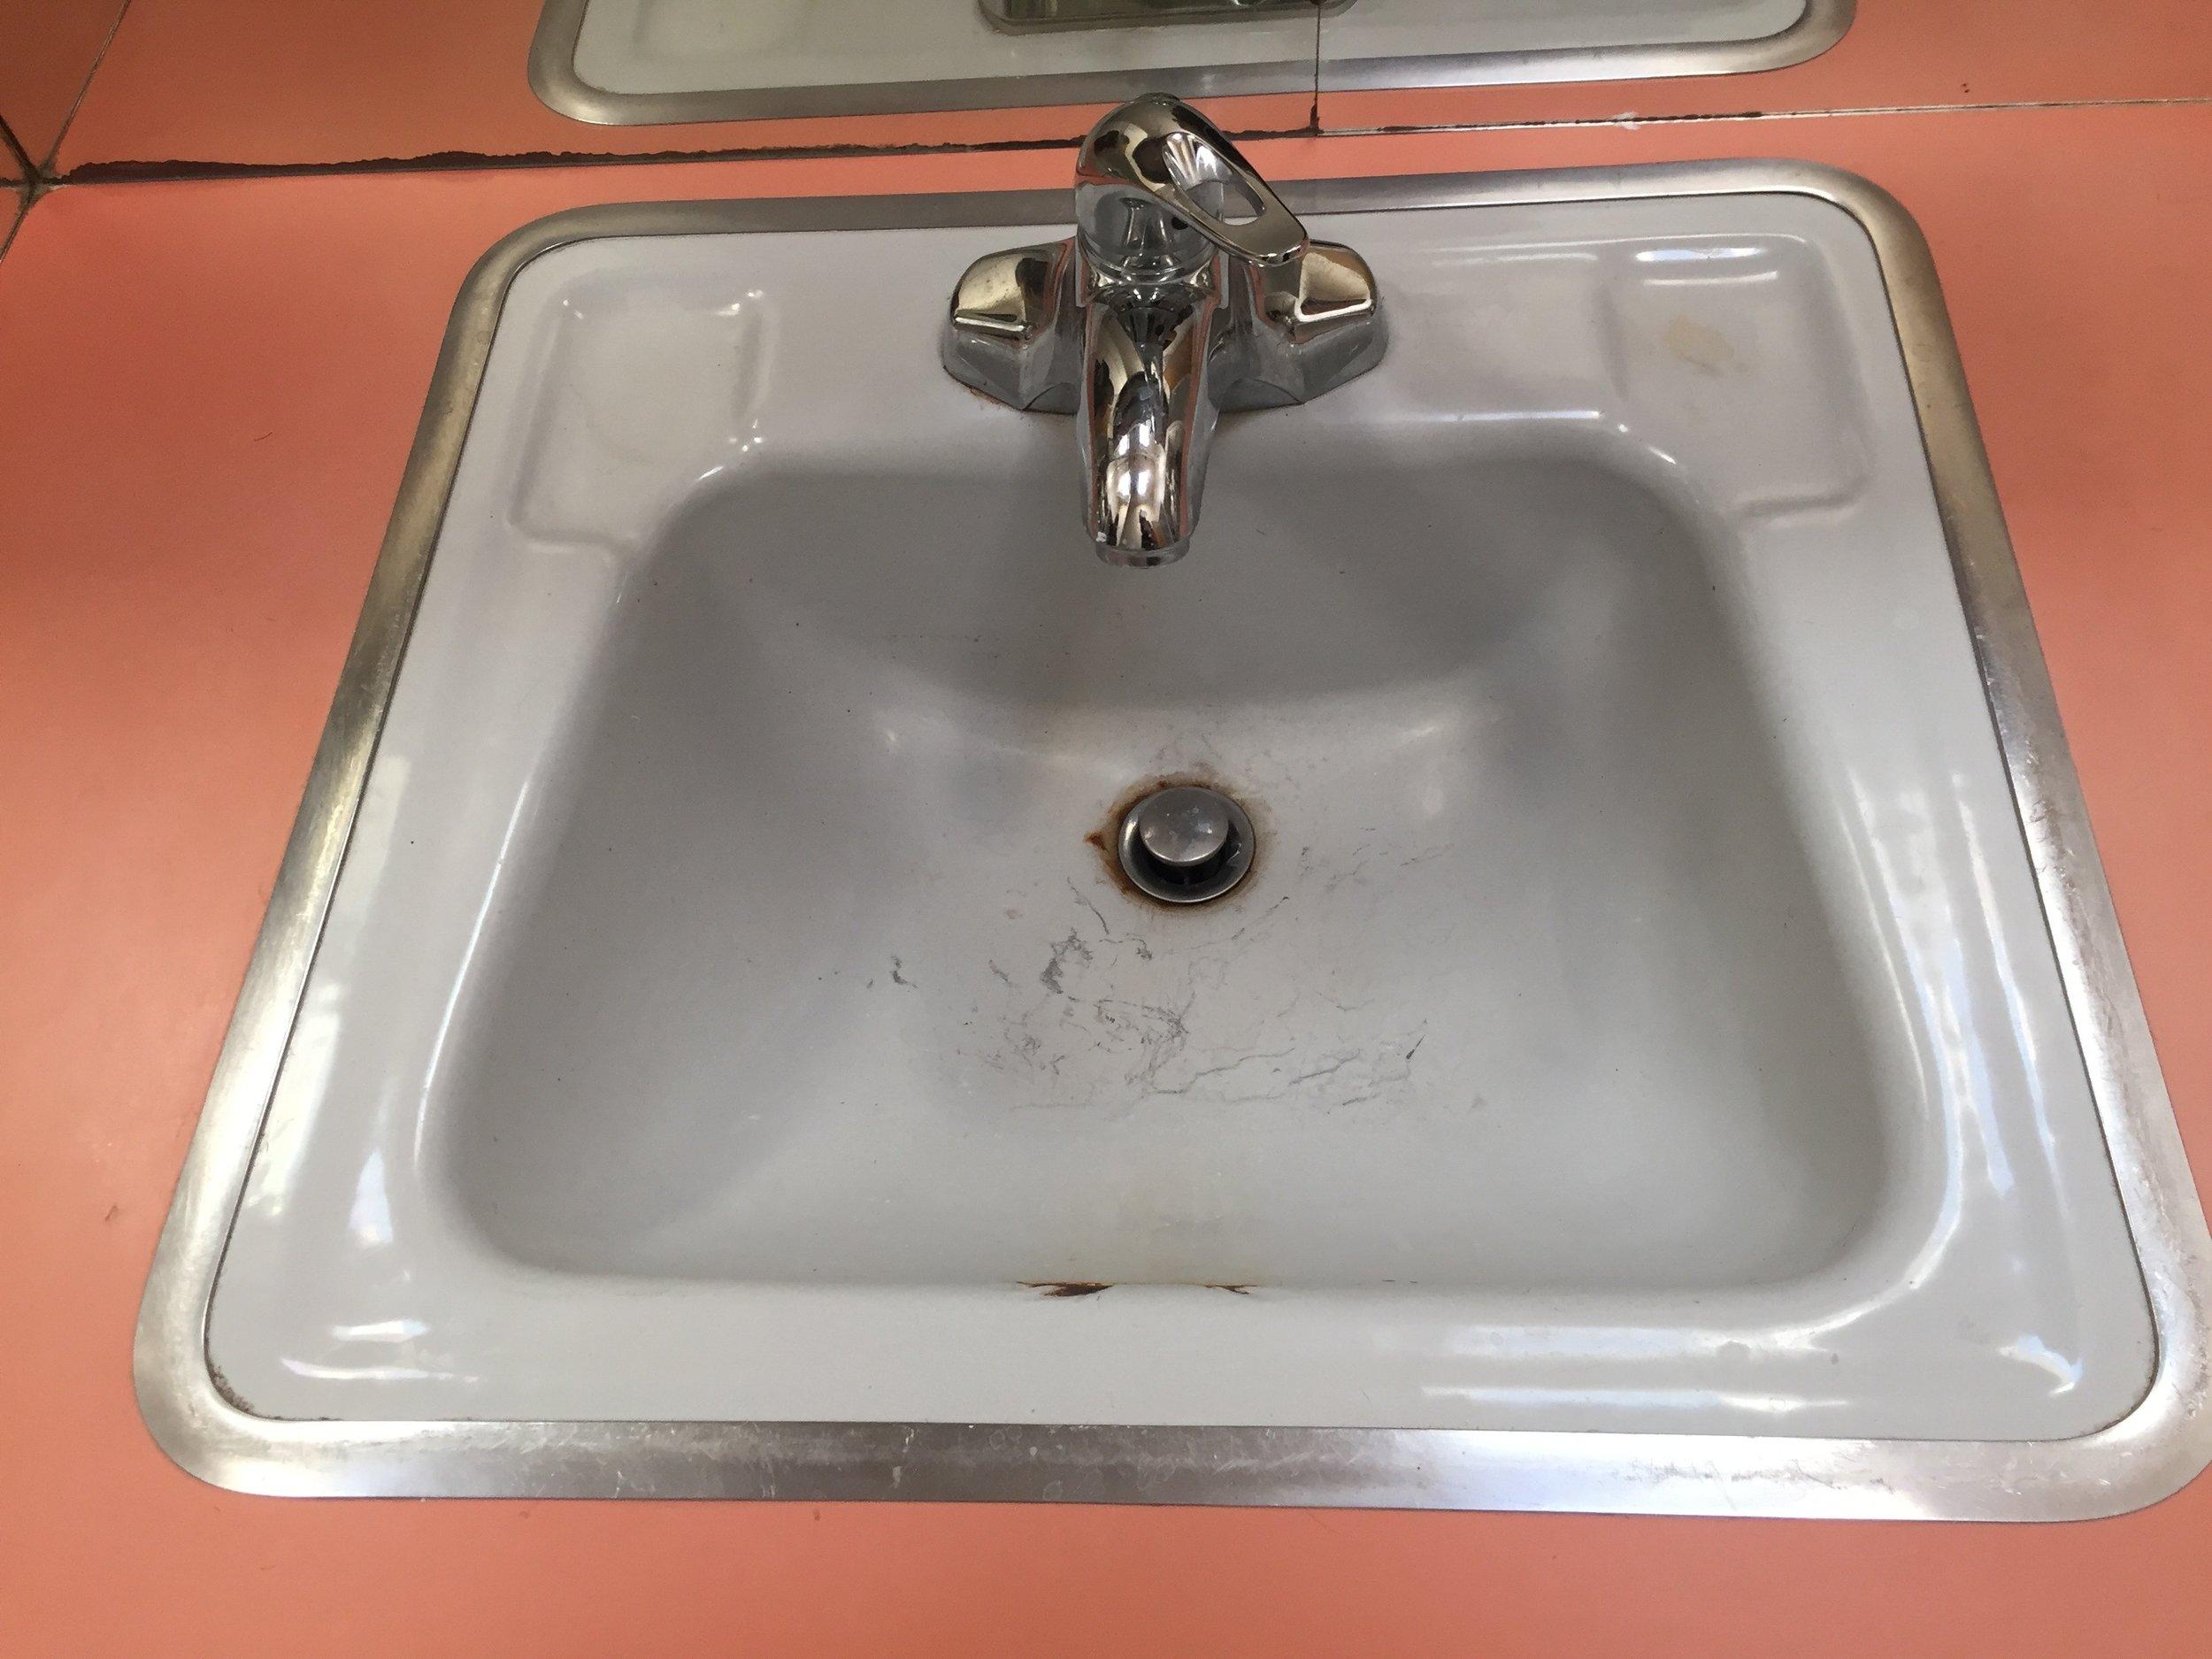 The original blue sink. The bathroom had a matching tub.